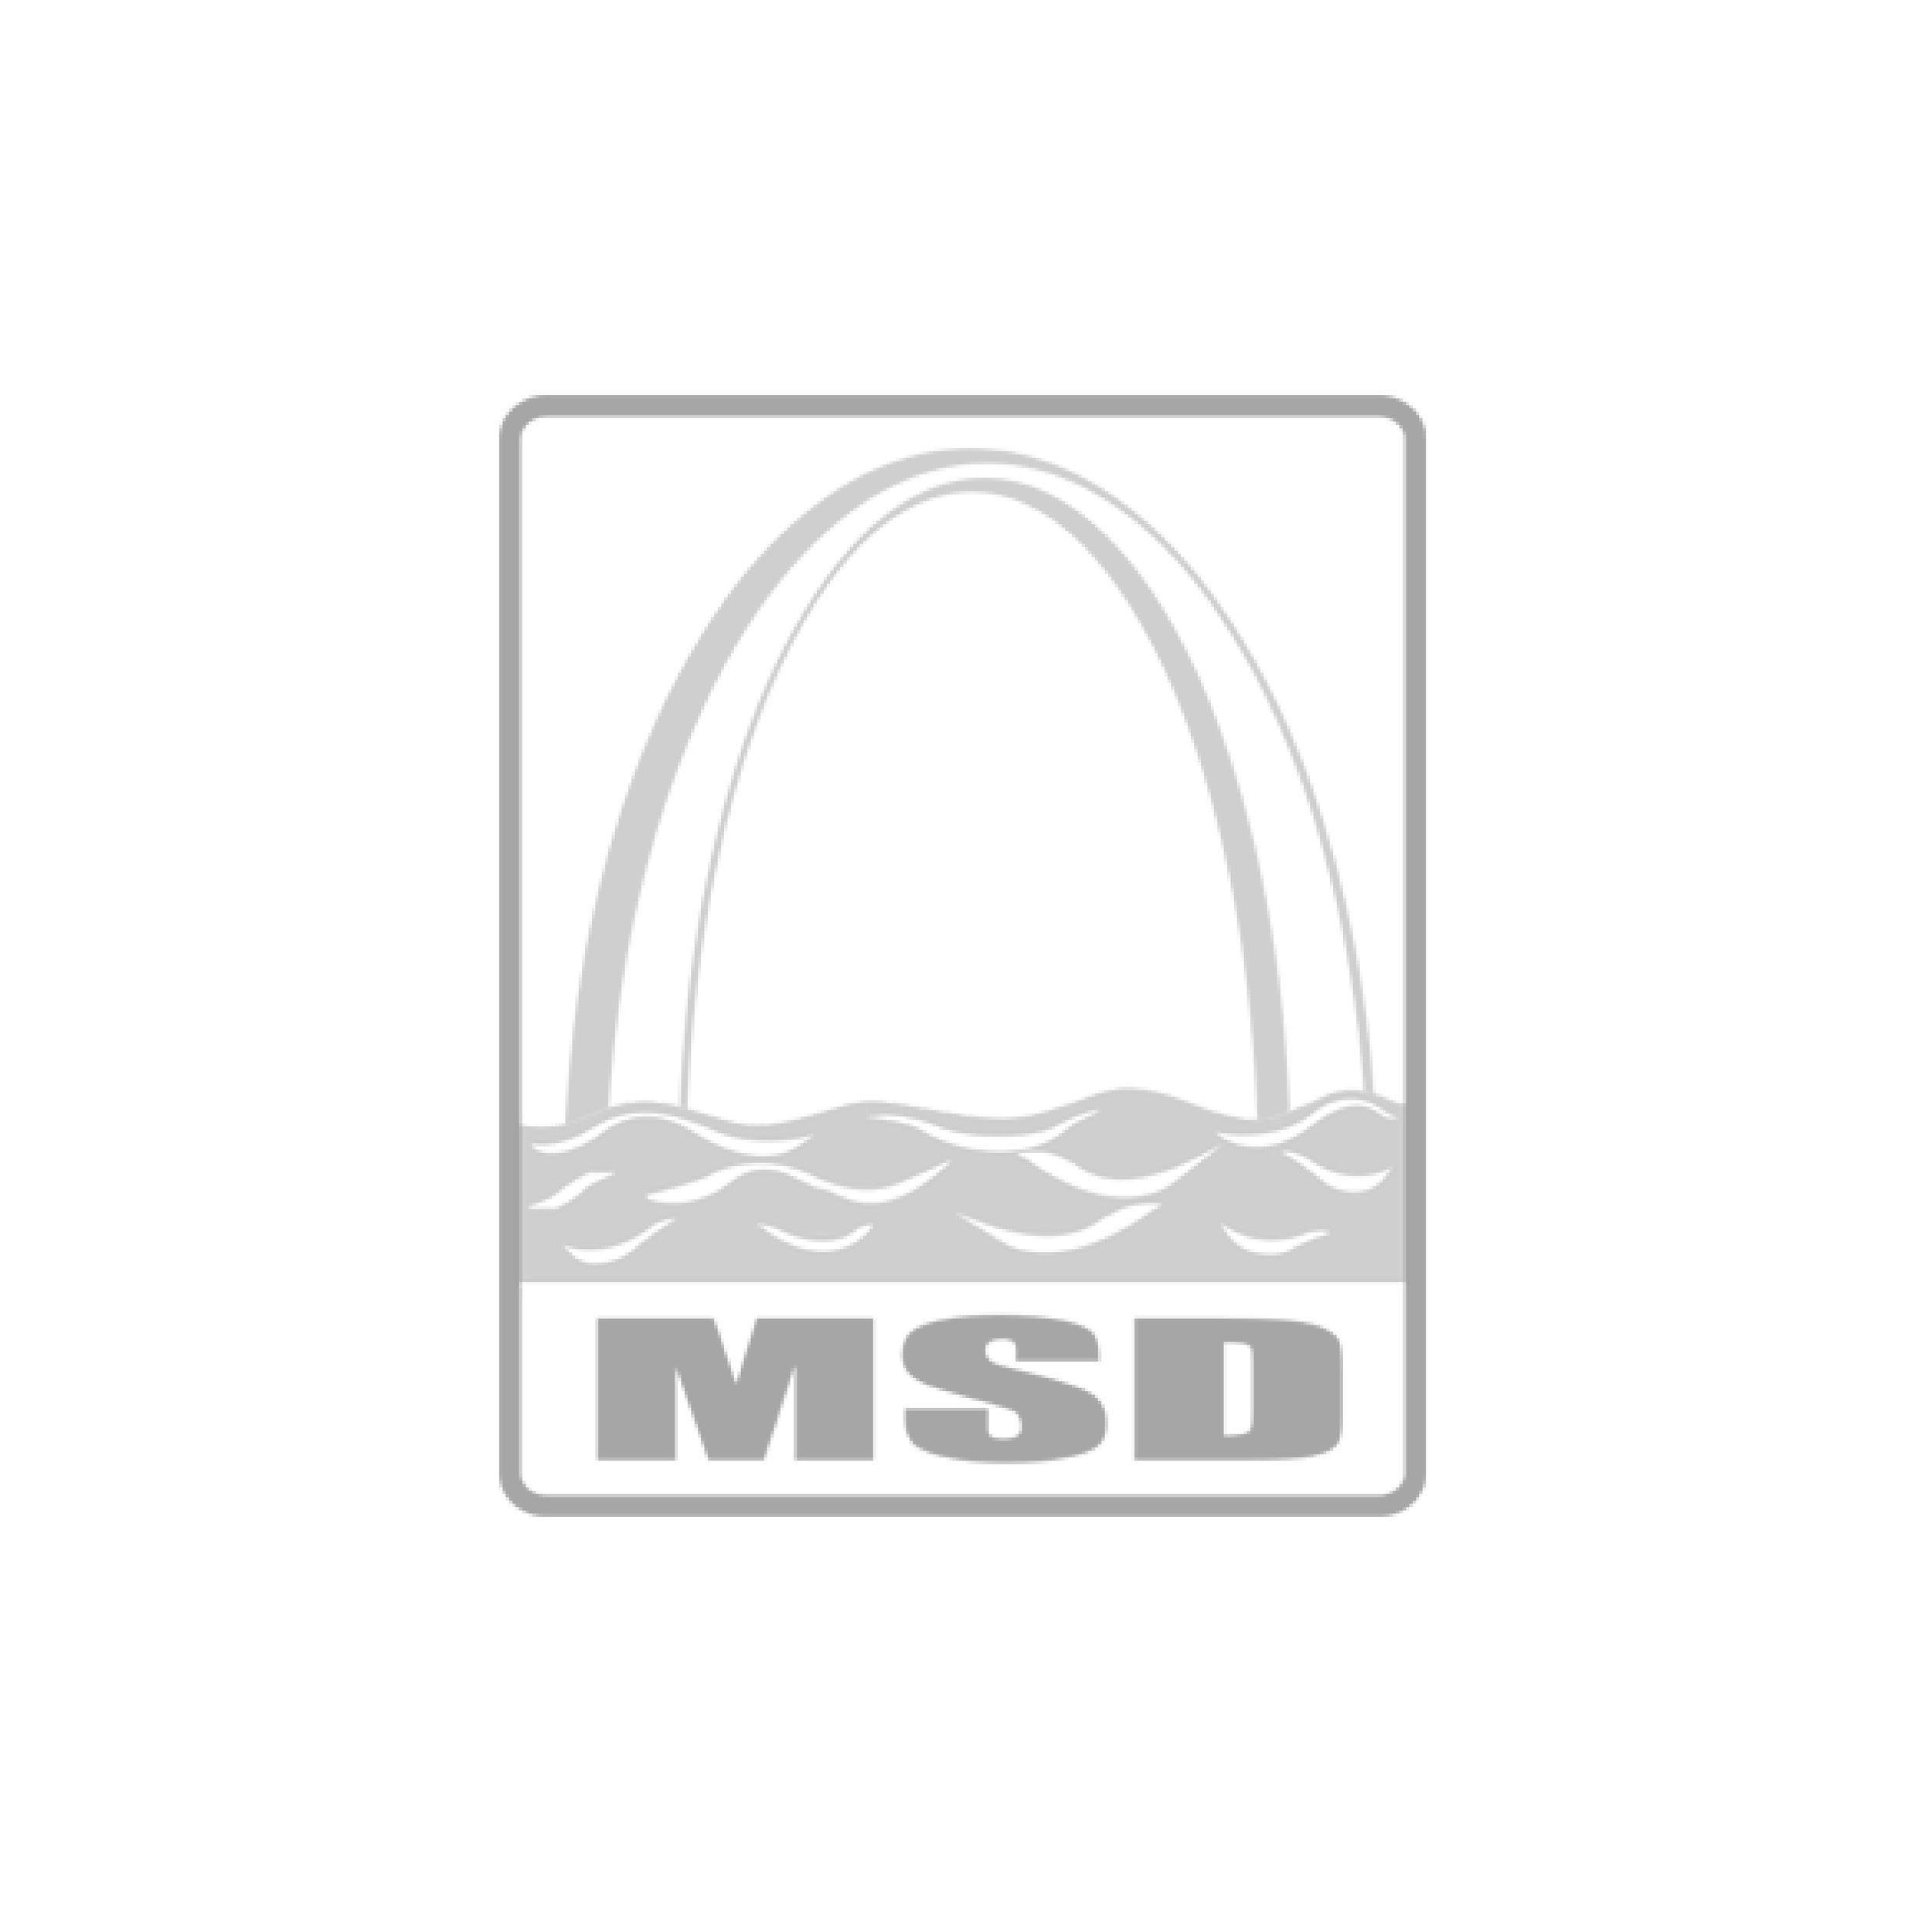 MSD-01.jpg